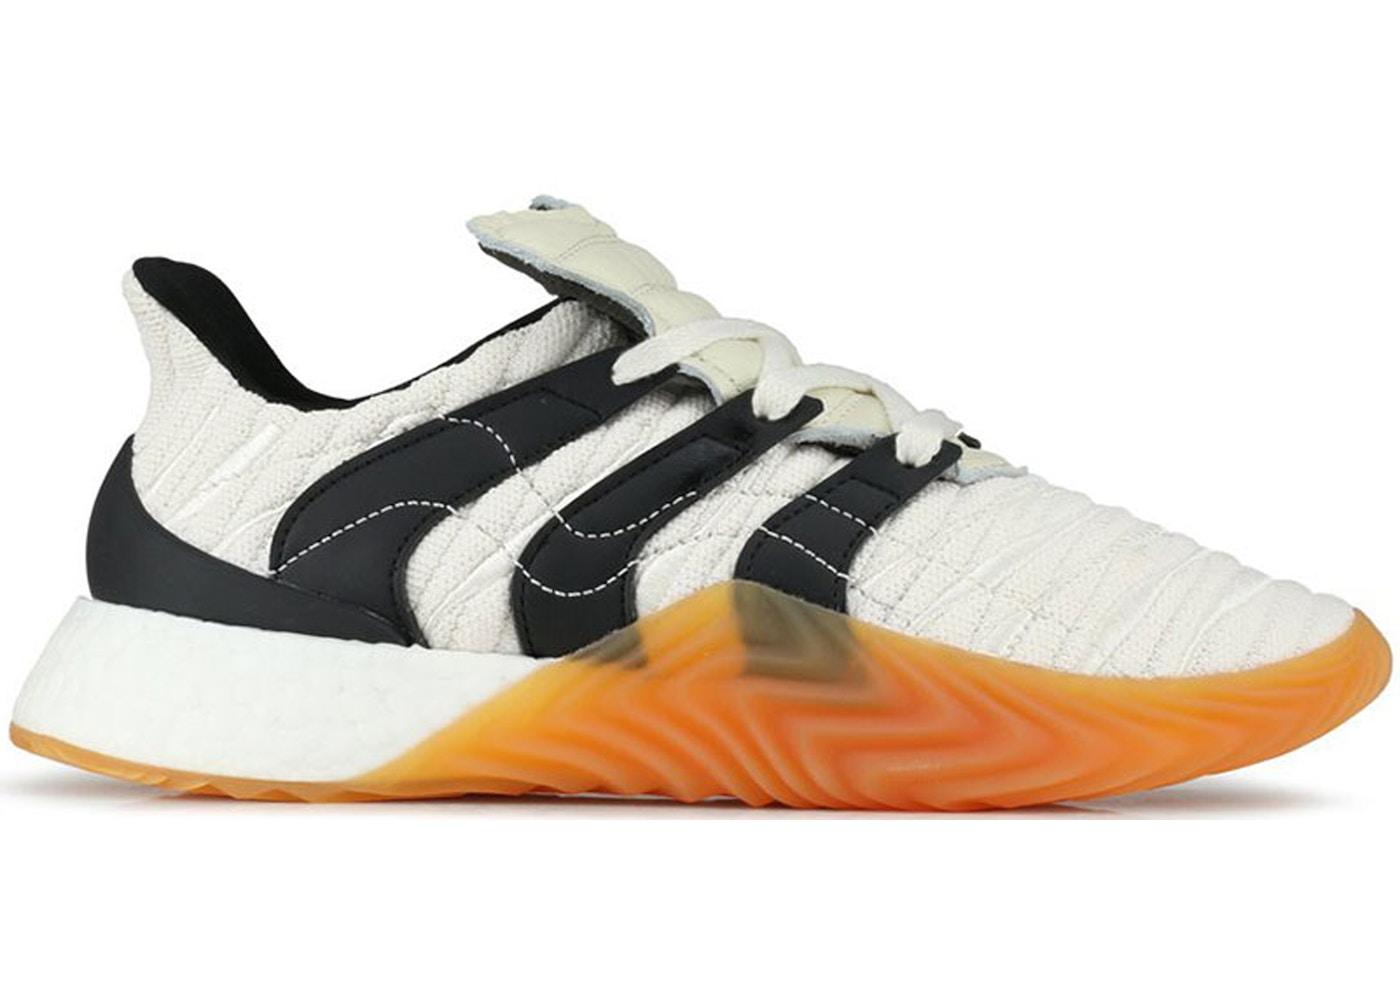 sports shoes 5fec7 85d3e adidas Sobakov Boost White Black